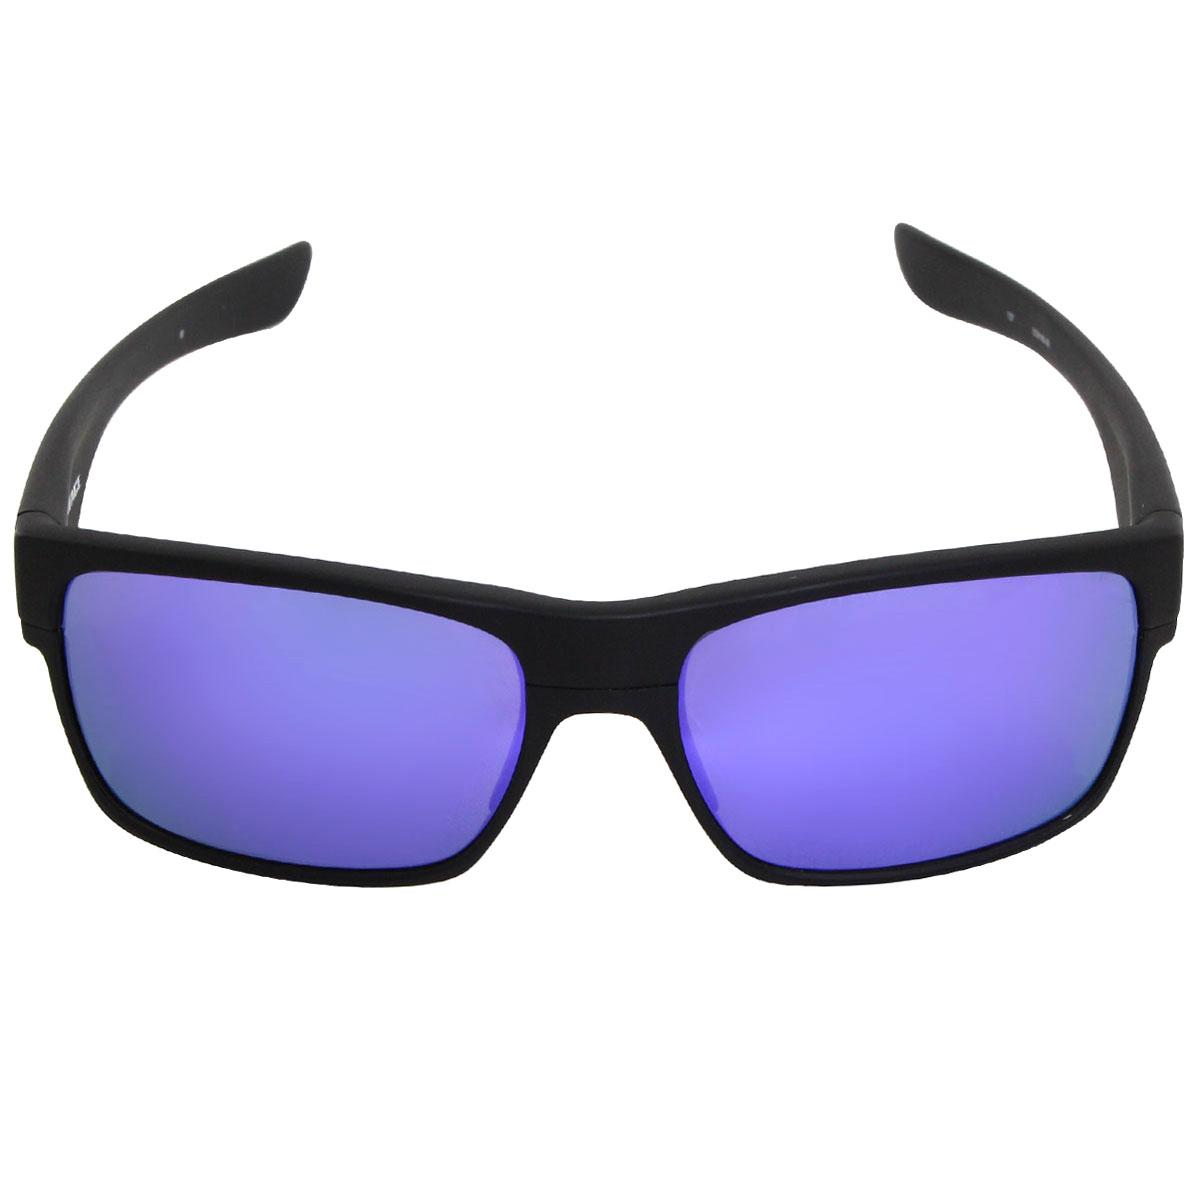 Oculos Oakley TwoFace Matte Black Violet Iridium ref OO9189-08 094ab13fc1